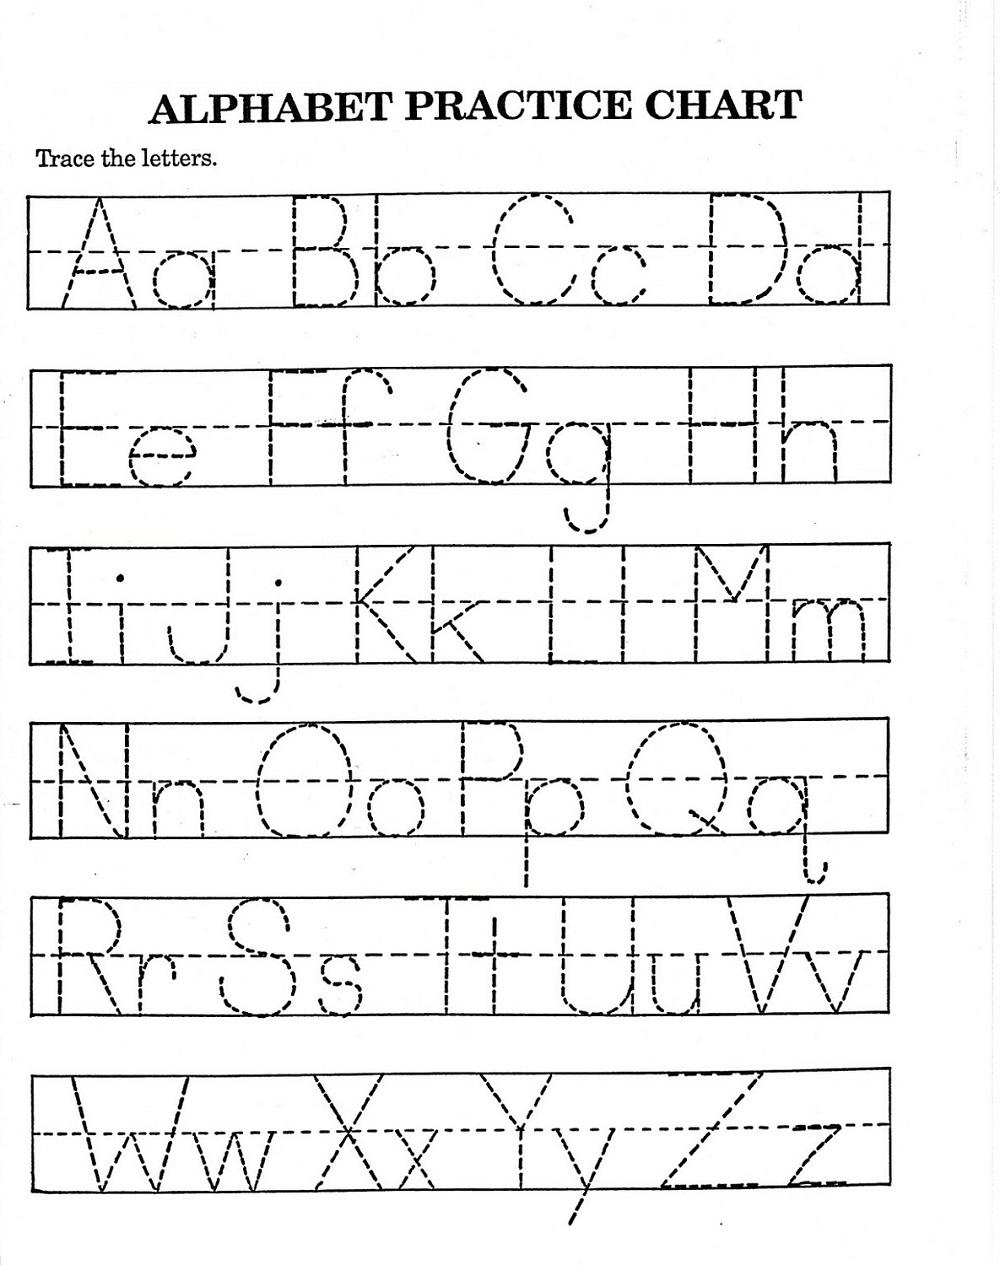 Traceable Alphabet Worksheets A-Z | Activity Shelter inside Alphabet Writing Worksheets A-Z